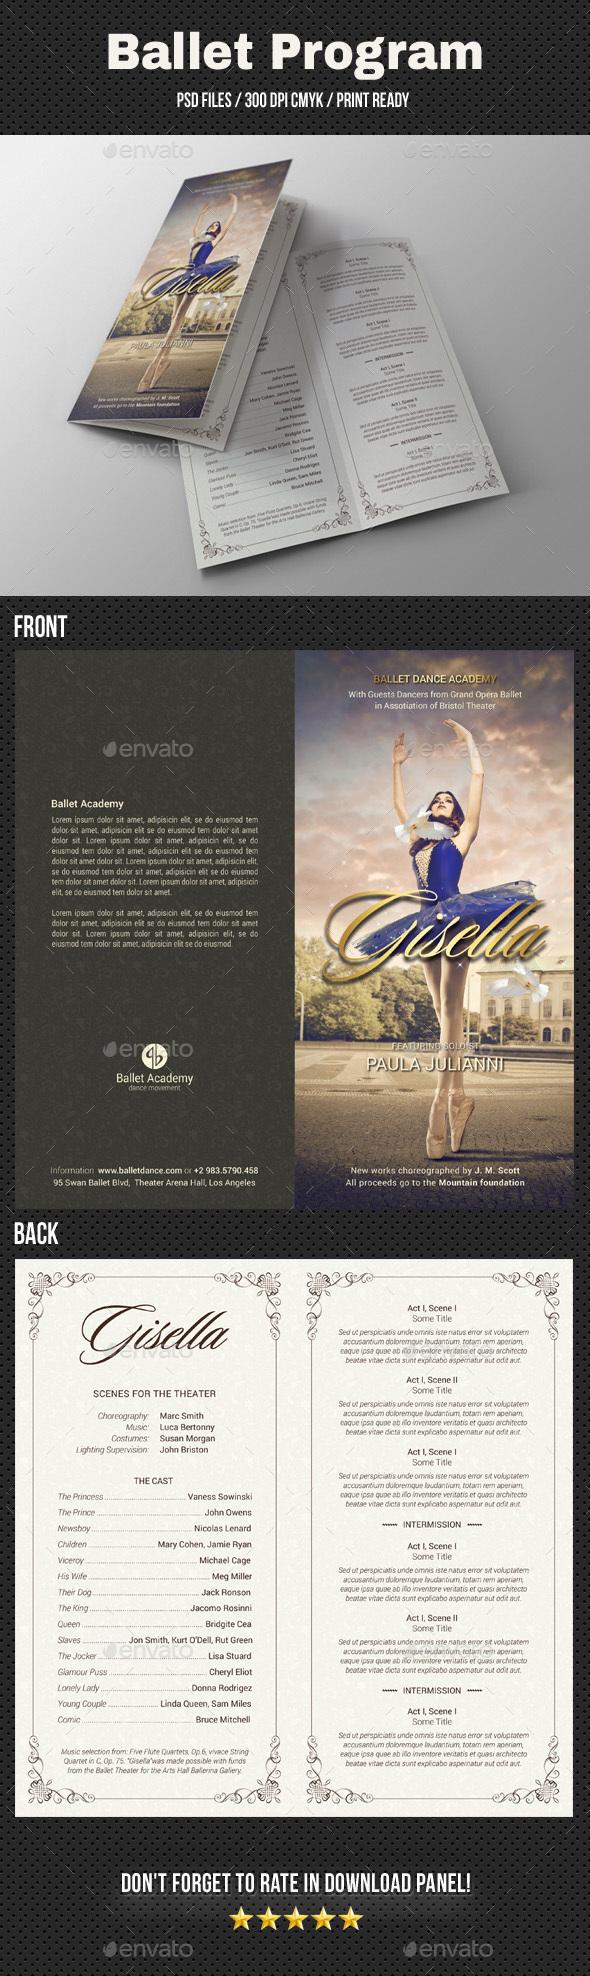 Ballet Program Bi-Fold Brochure - Brochures Print Templates